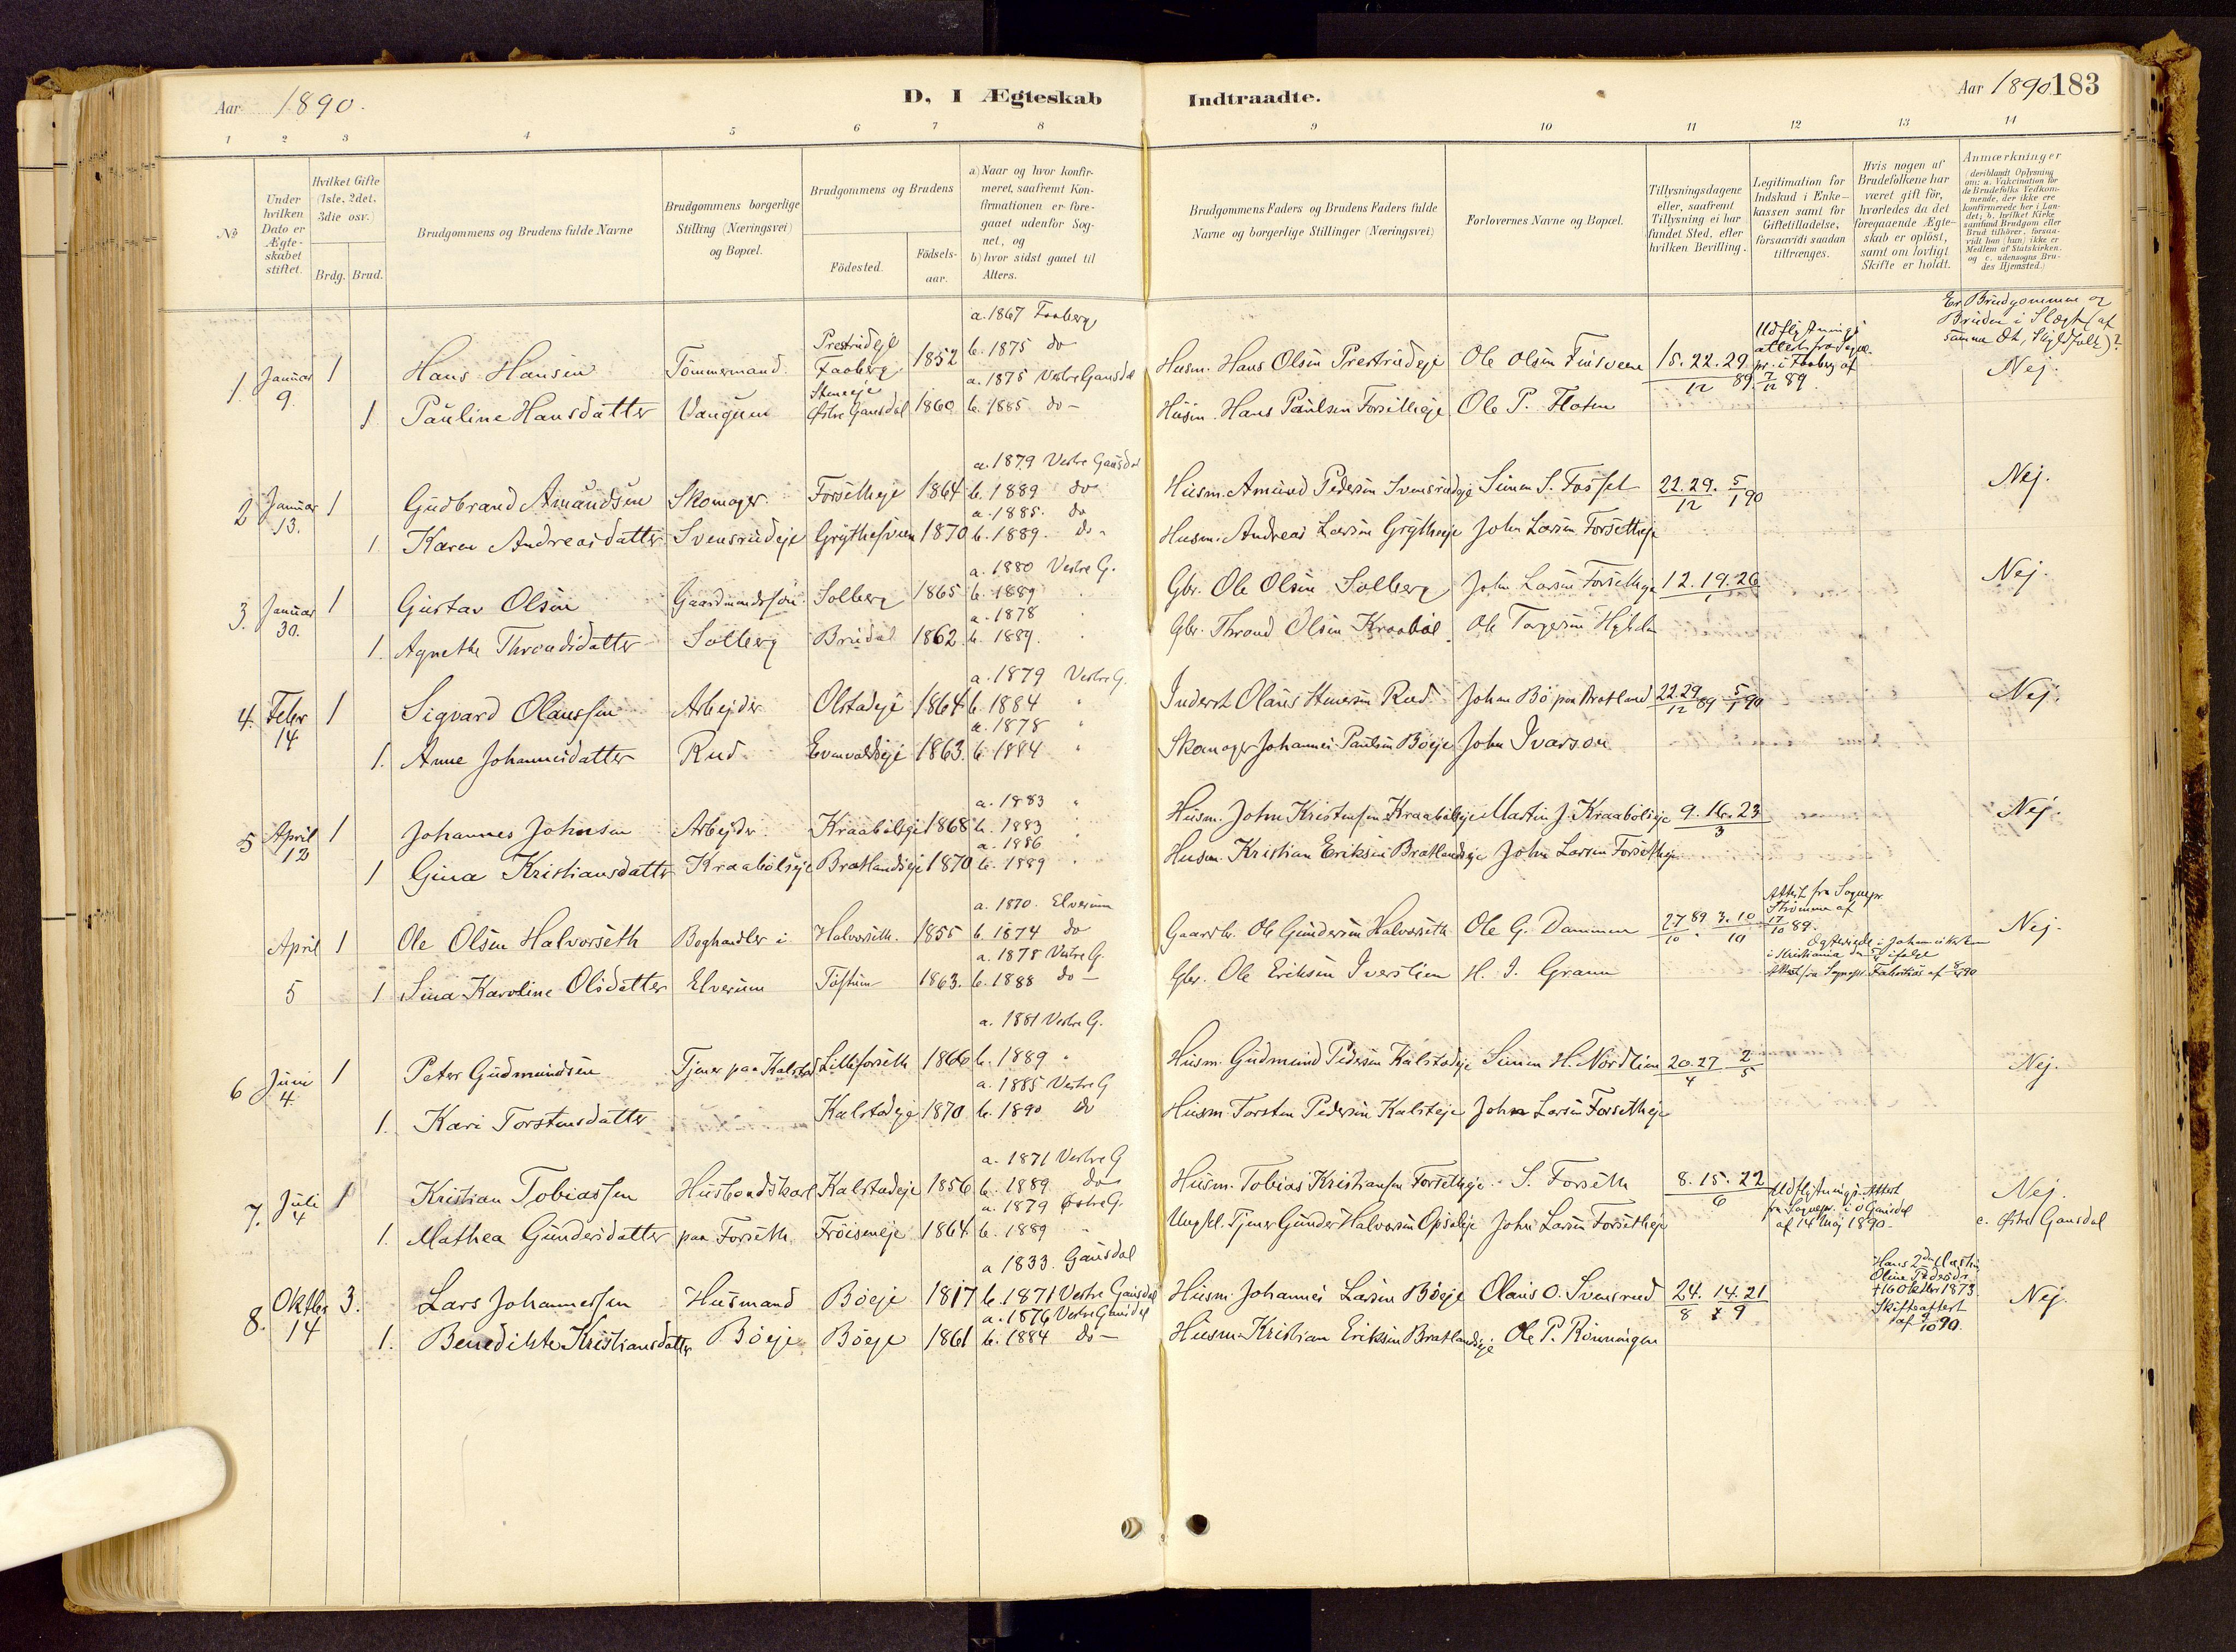 SAH, Vestre Gausdal prestekontor, Ministerialbok nr. 1, 1887-1914, s. 183